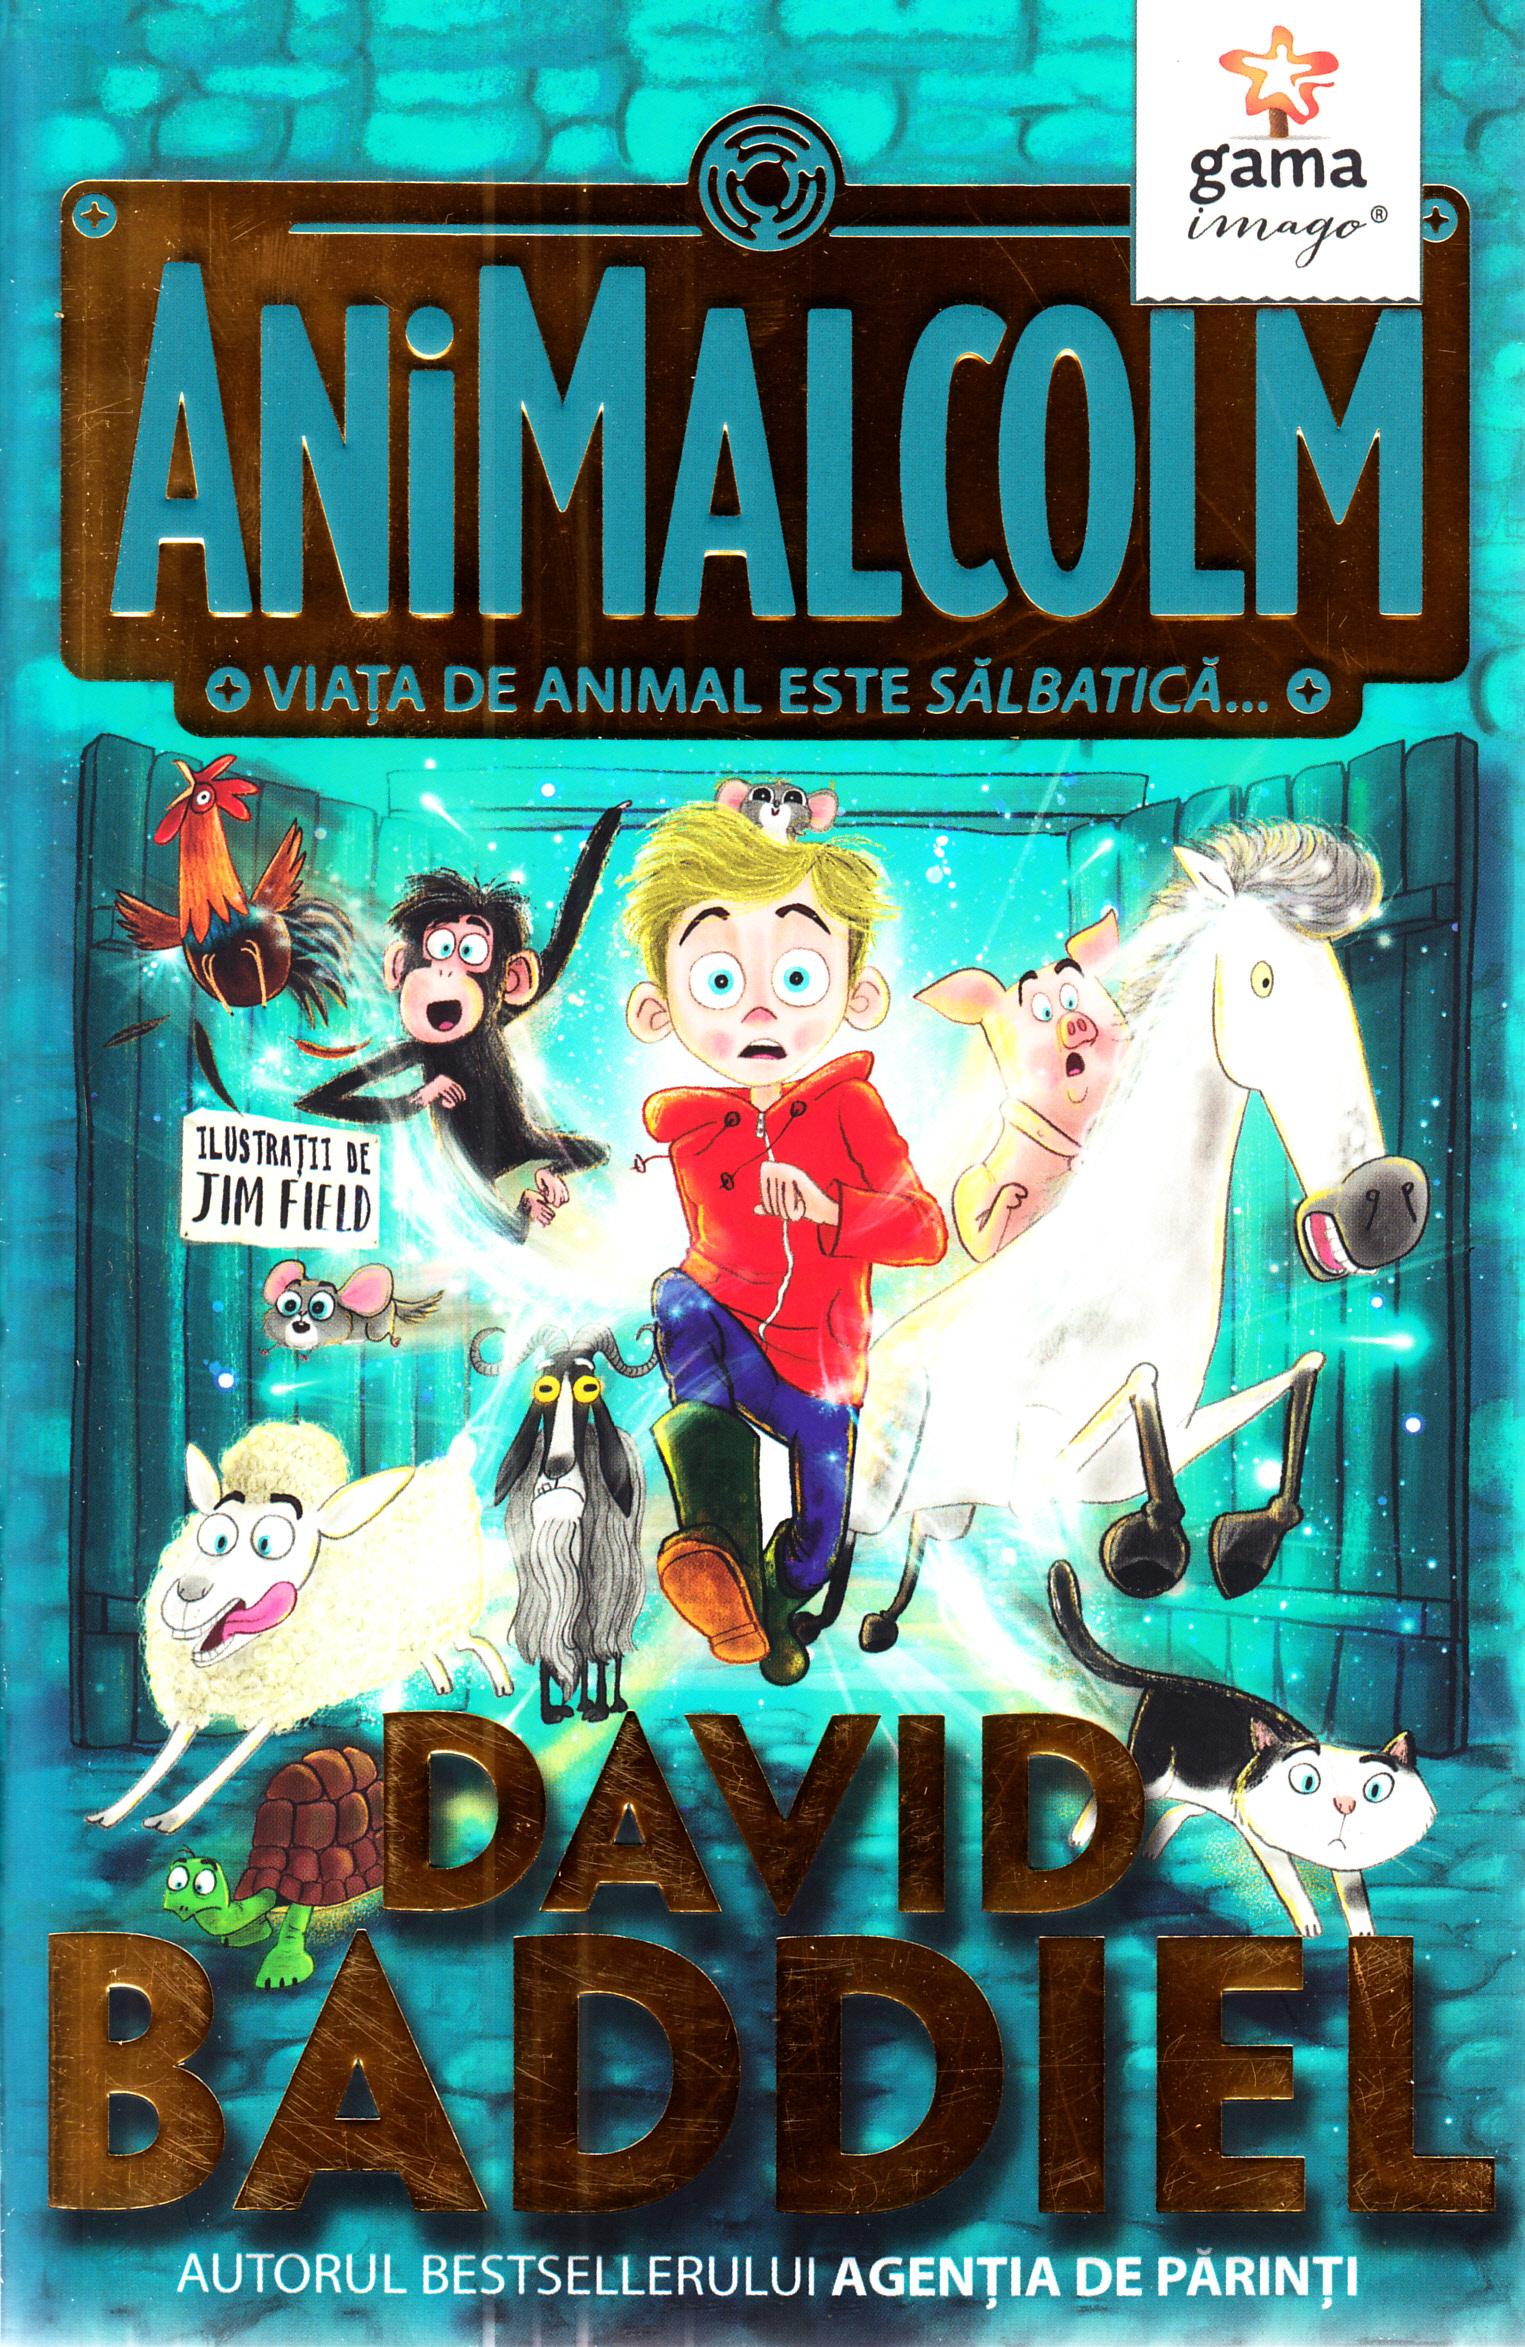 animalcolm